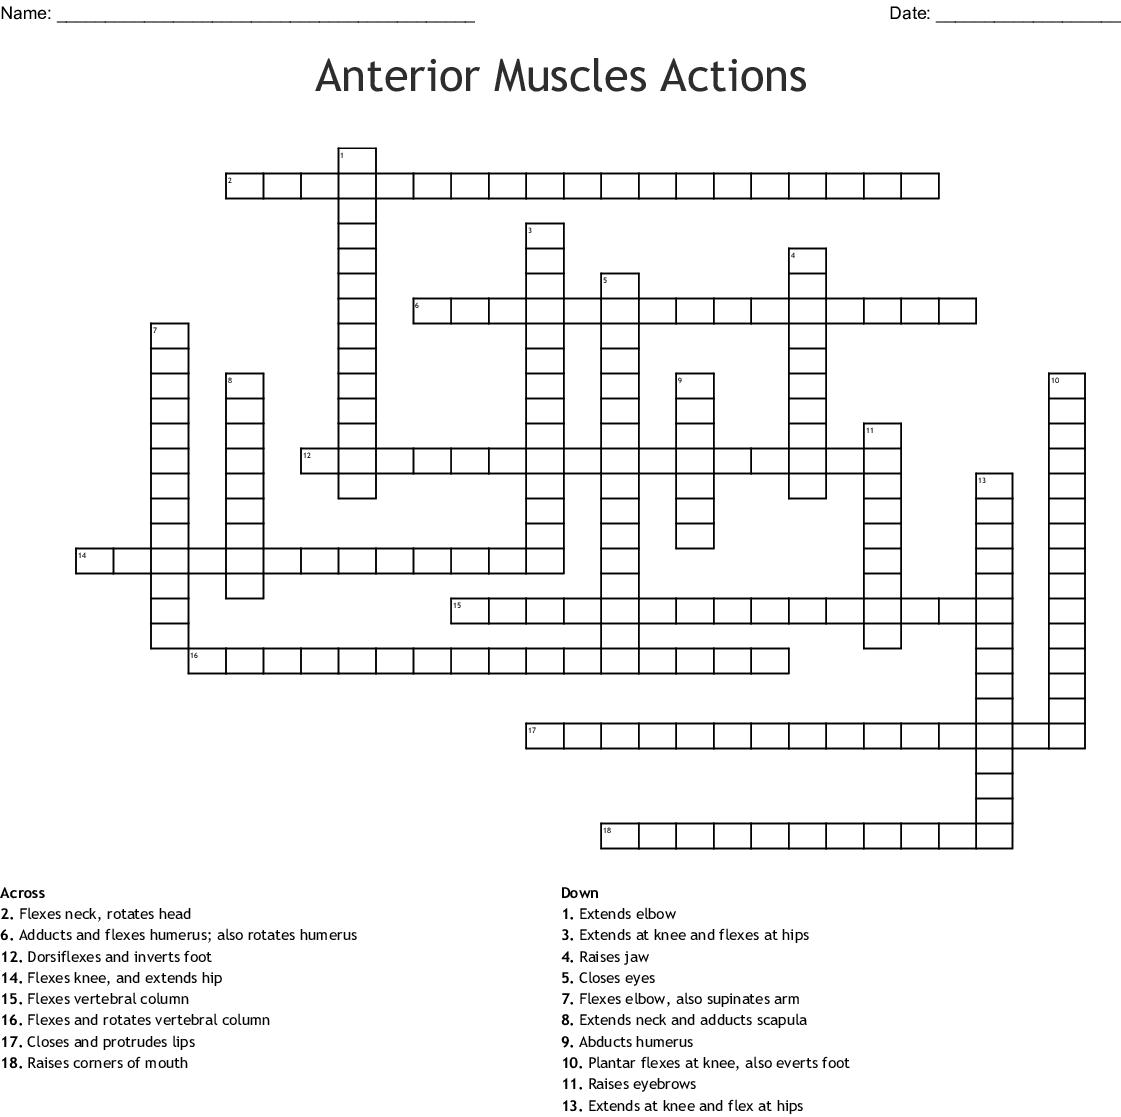 Muscle Matching Worksheet